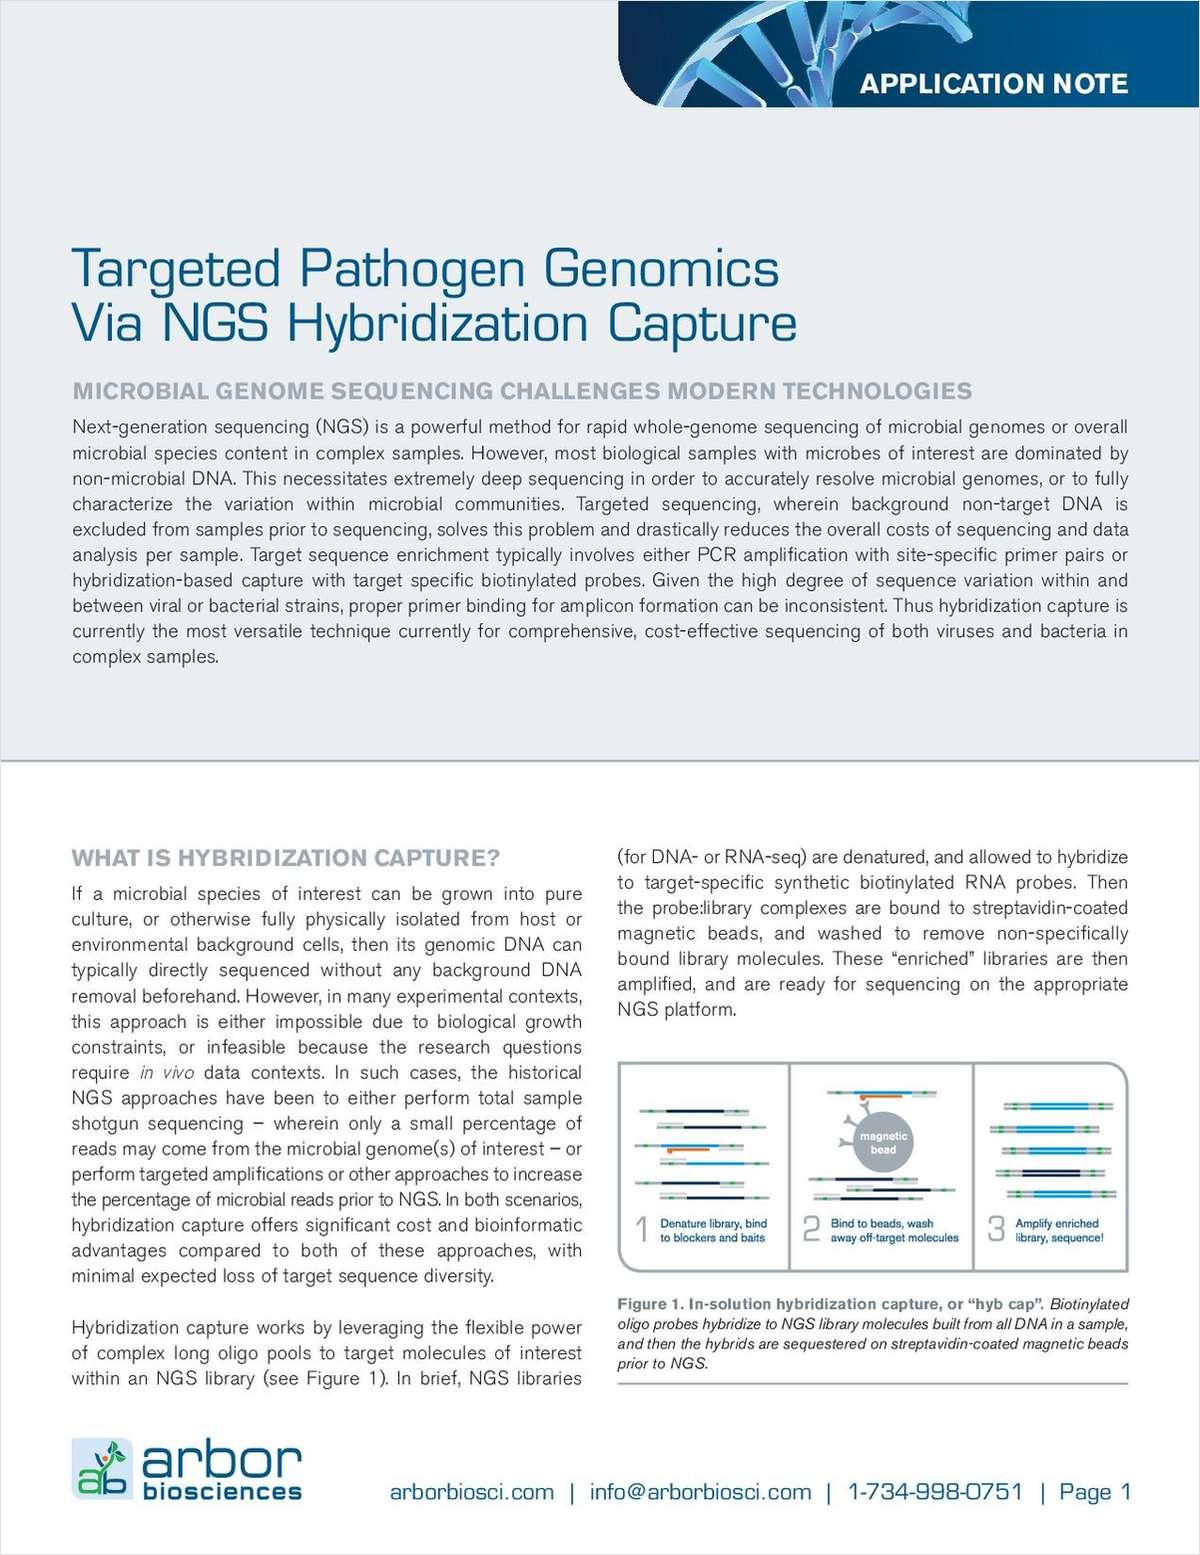 Targeted Pathogen Genomics via NGS Hybridization Capture